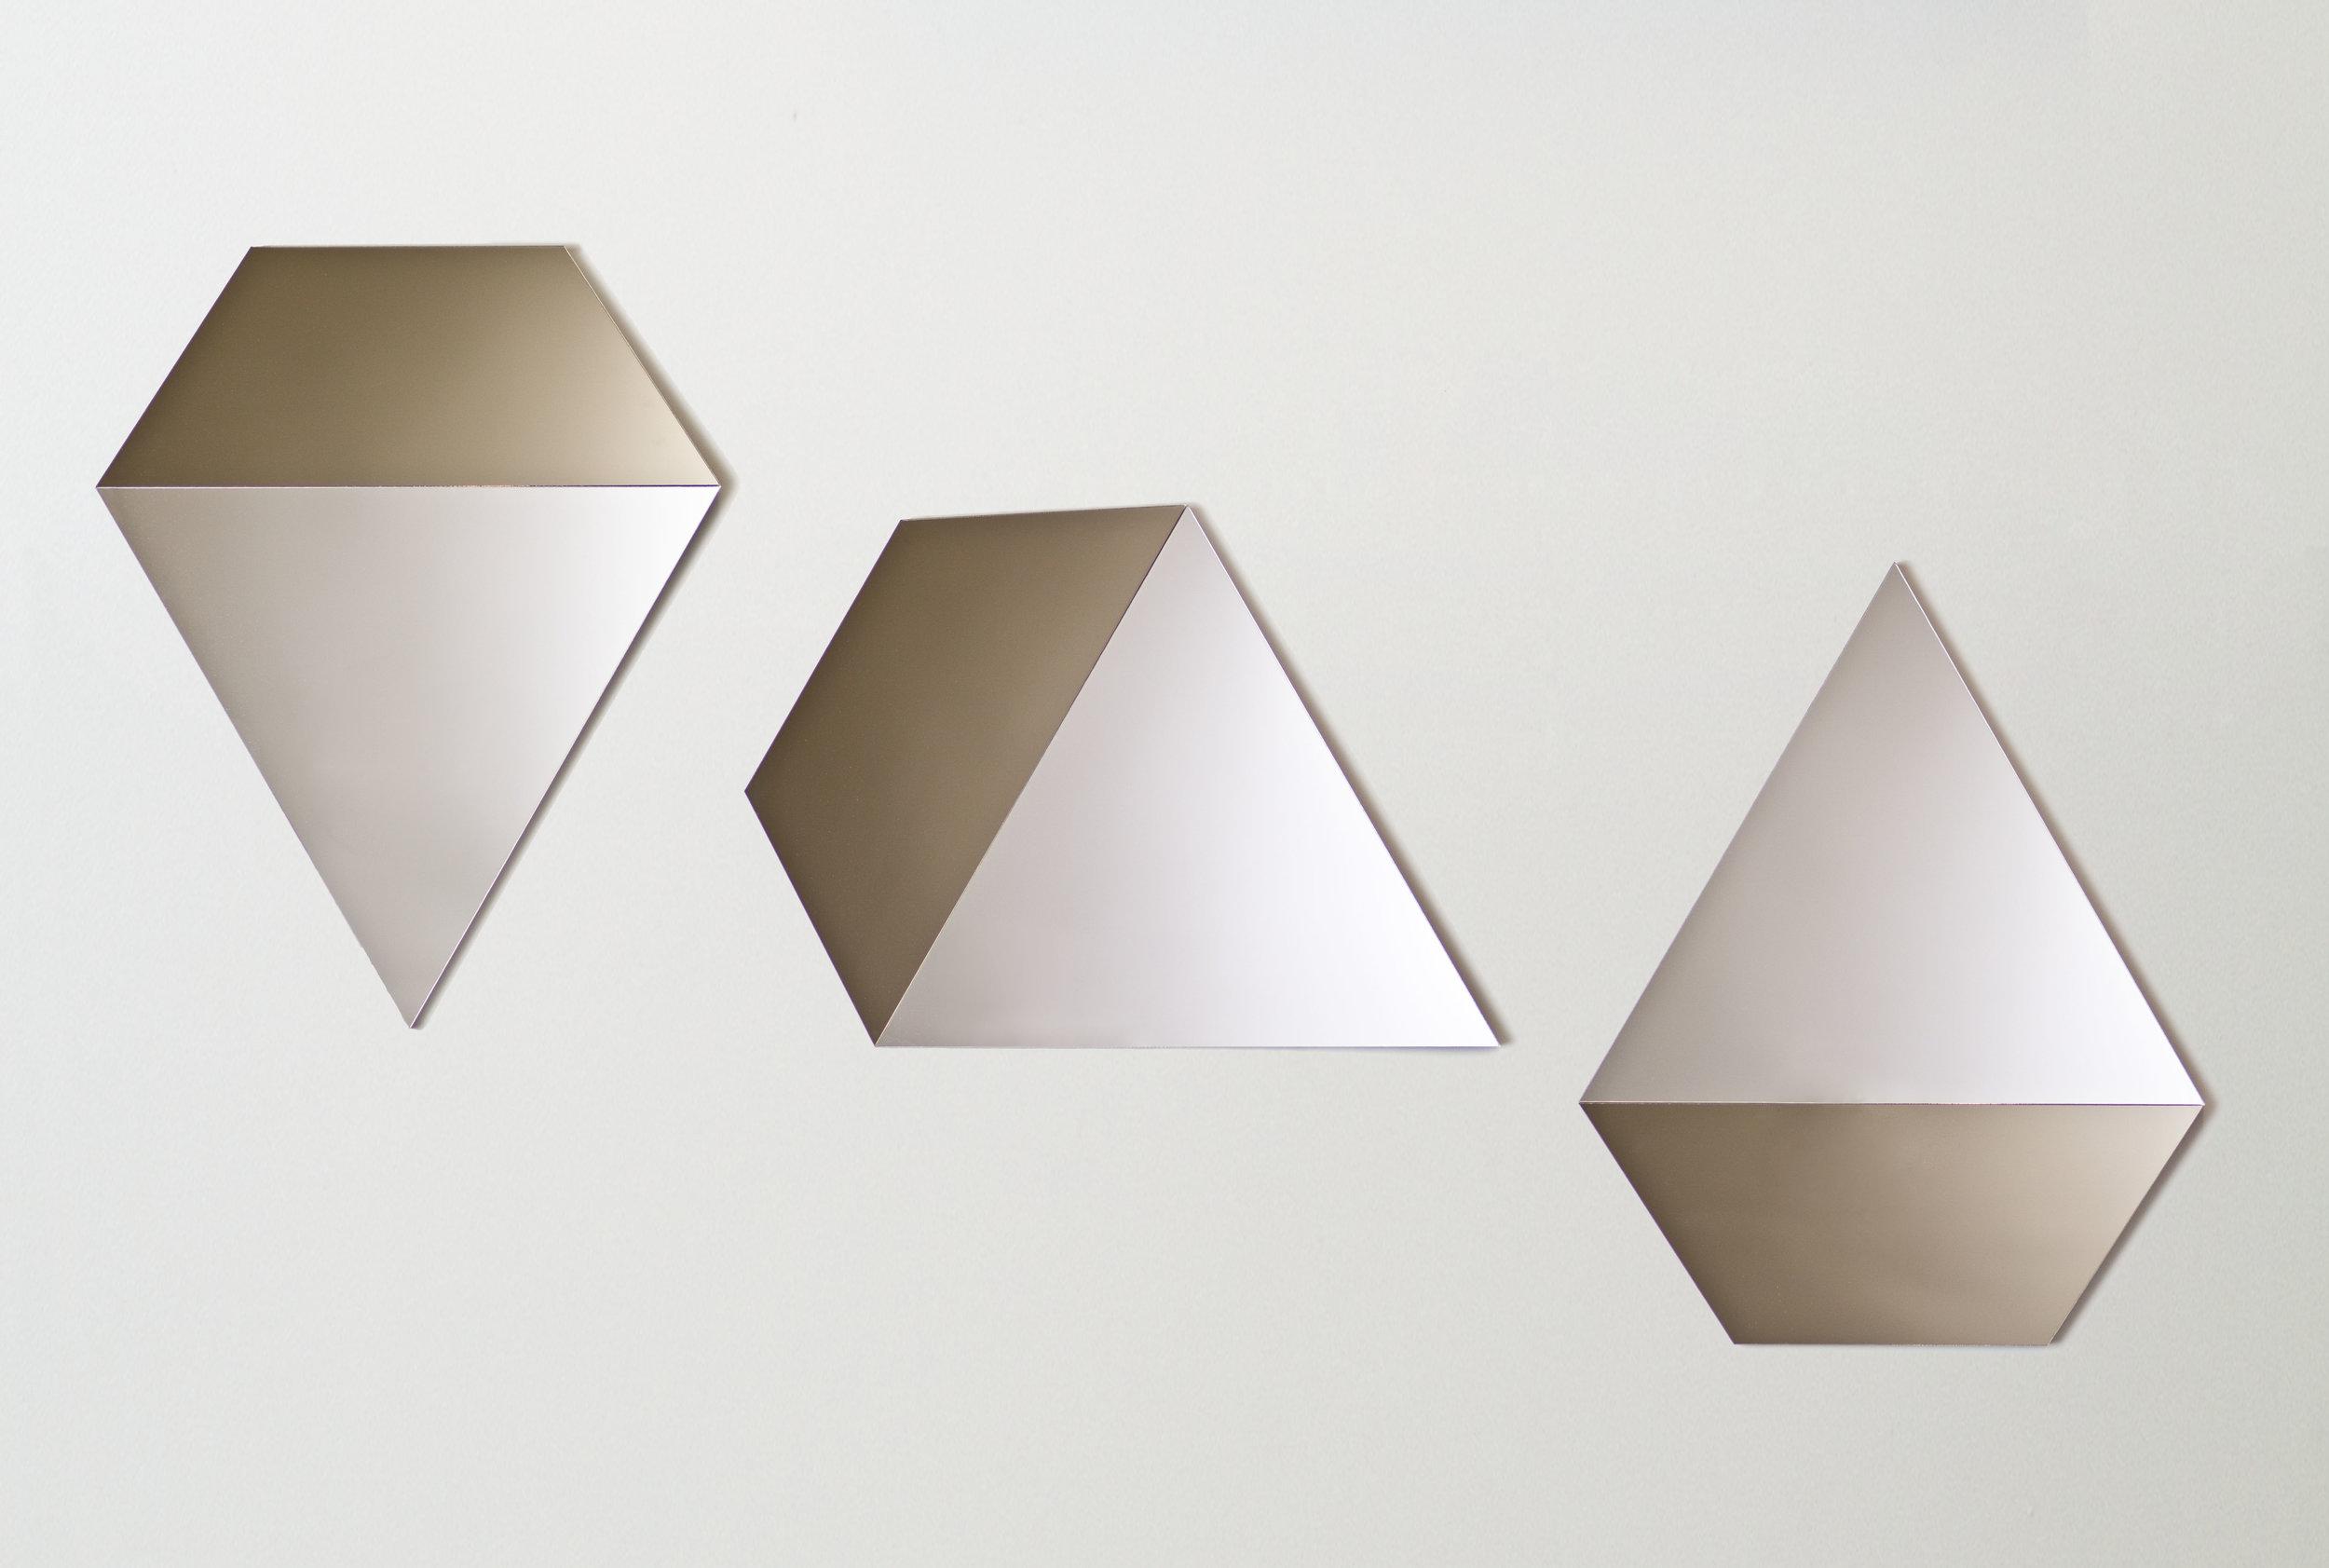 Mirror_Prism_Rotation_haideedrew.jpg